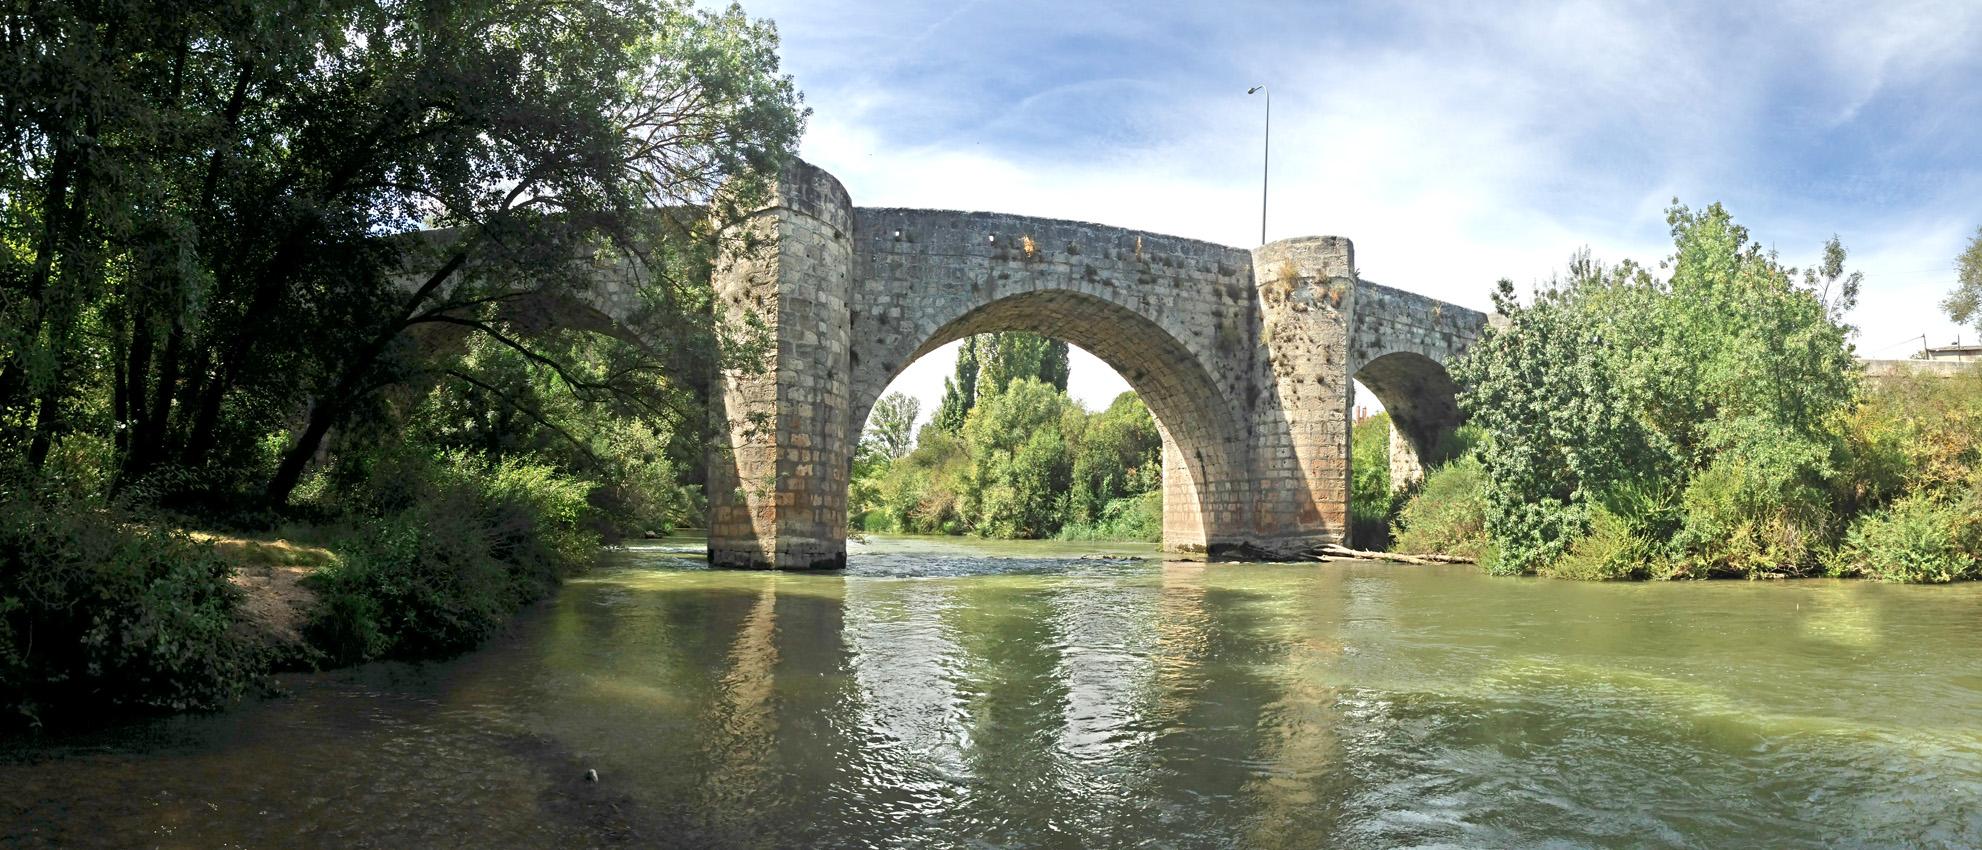 Puente quintanilla de on simo y olivares de duero ruta for Linea duero oficina virtual